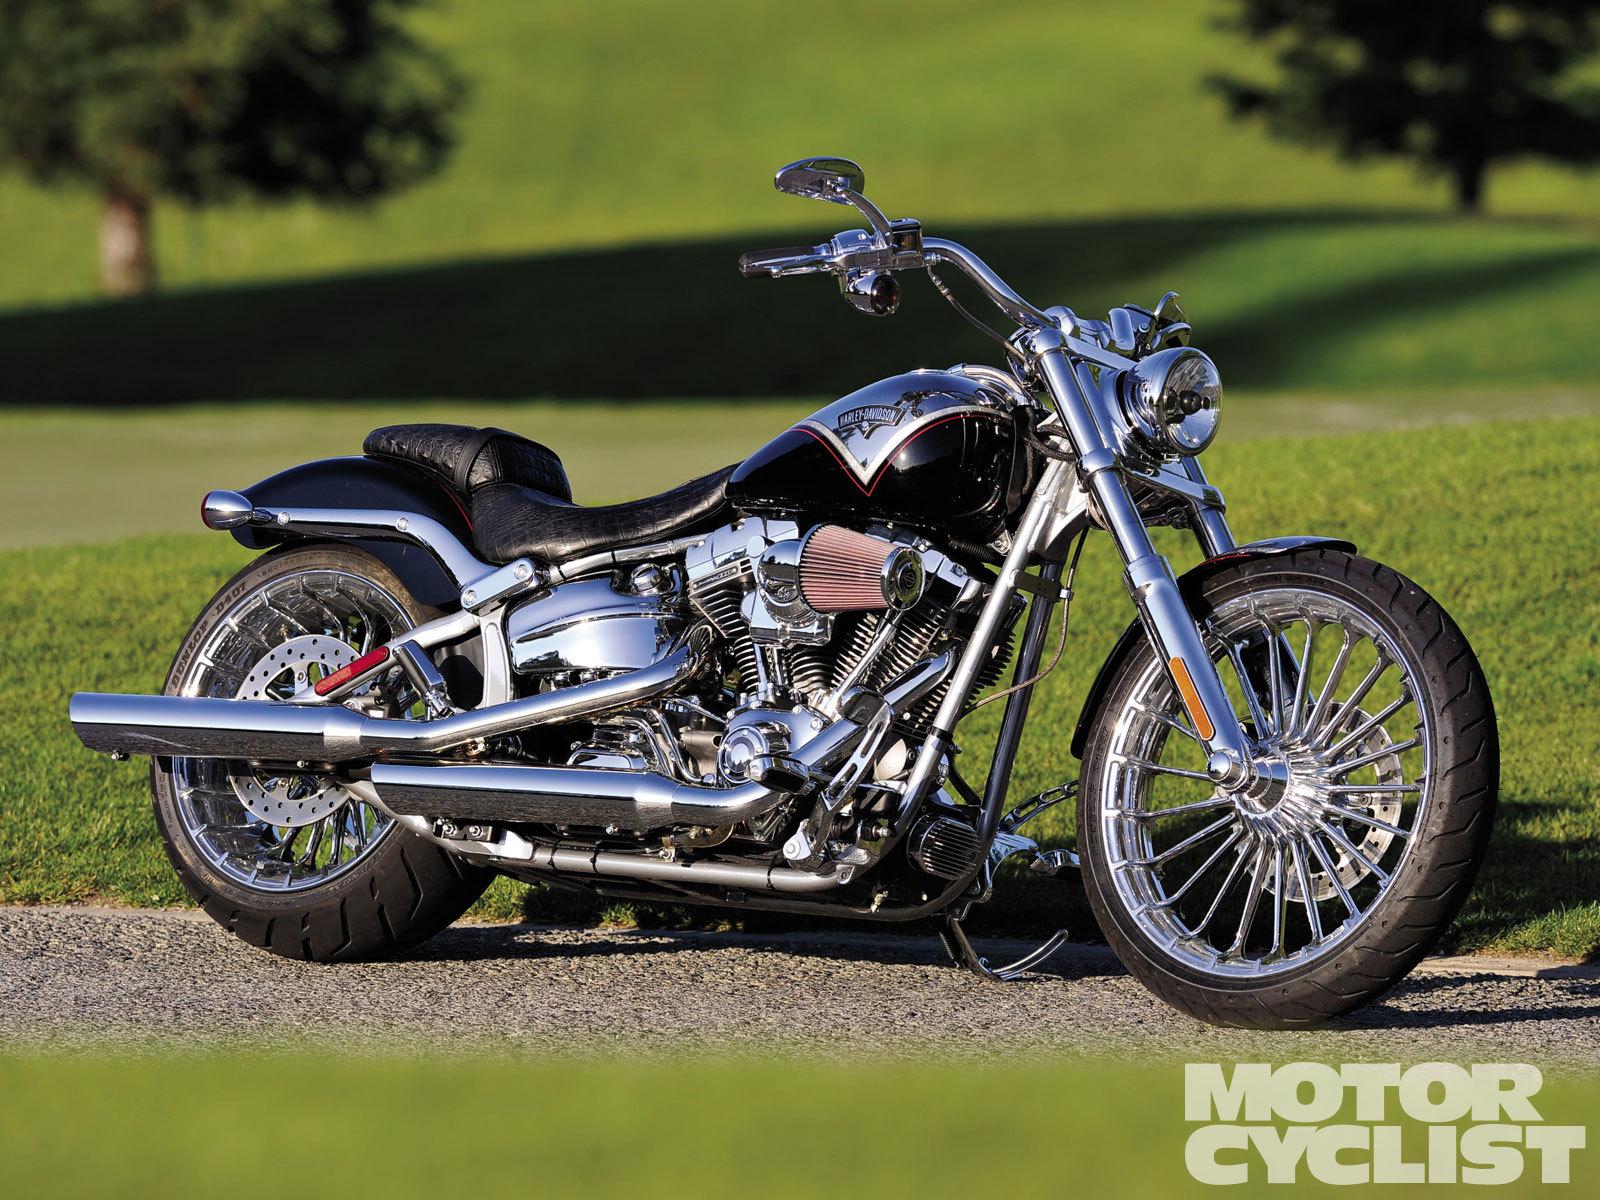 New motorcycle Harley-Davidson - 474.0KB